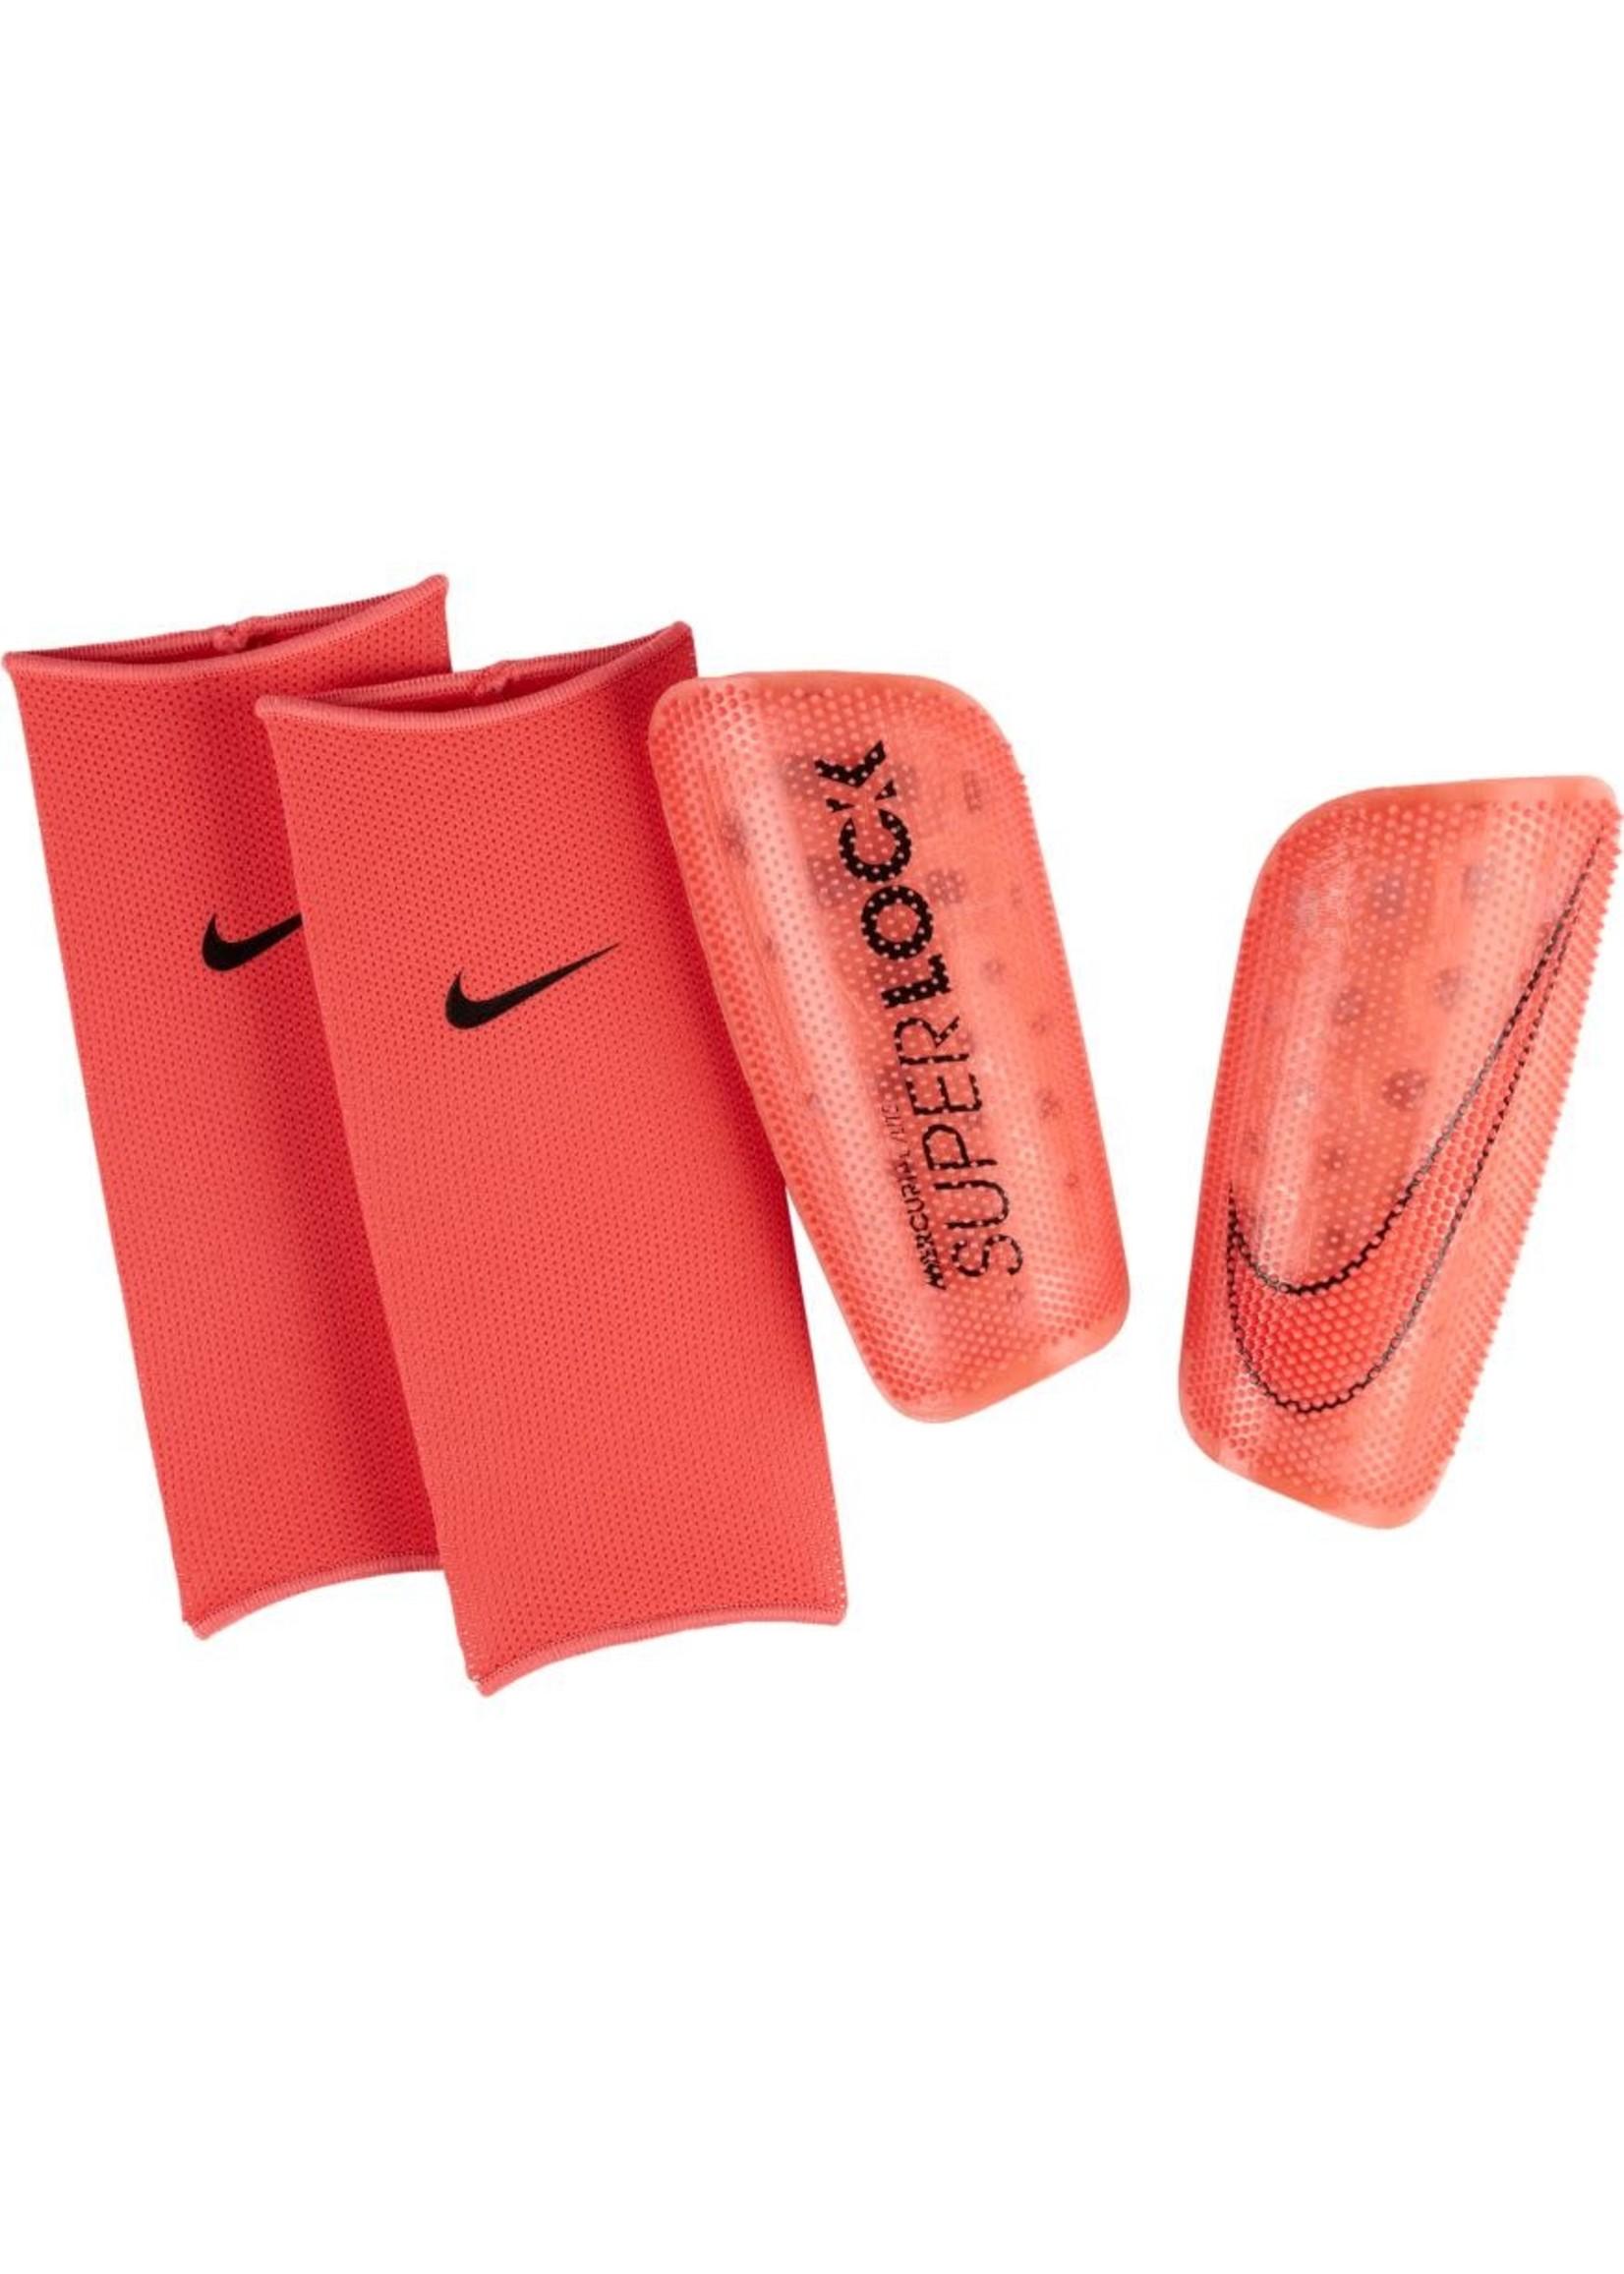 Nike Mercurial Lite with Superlock